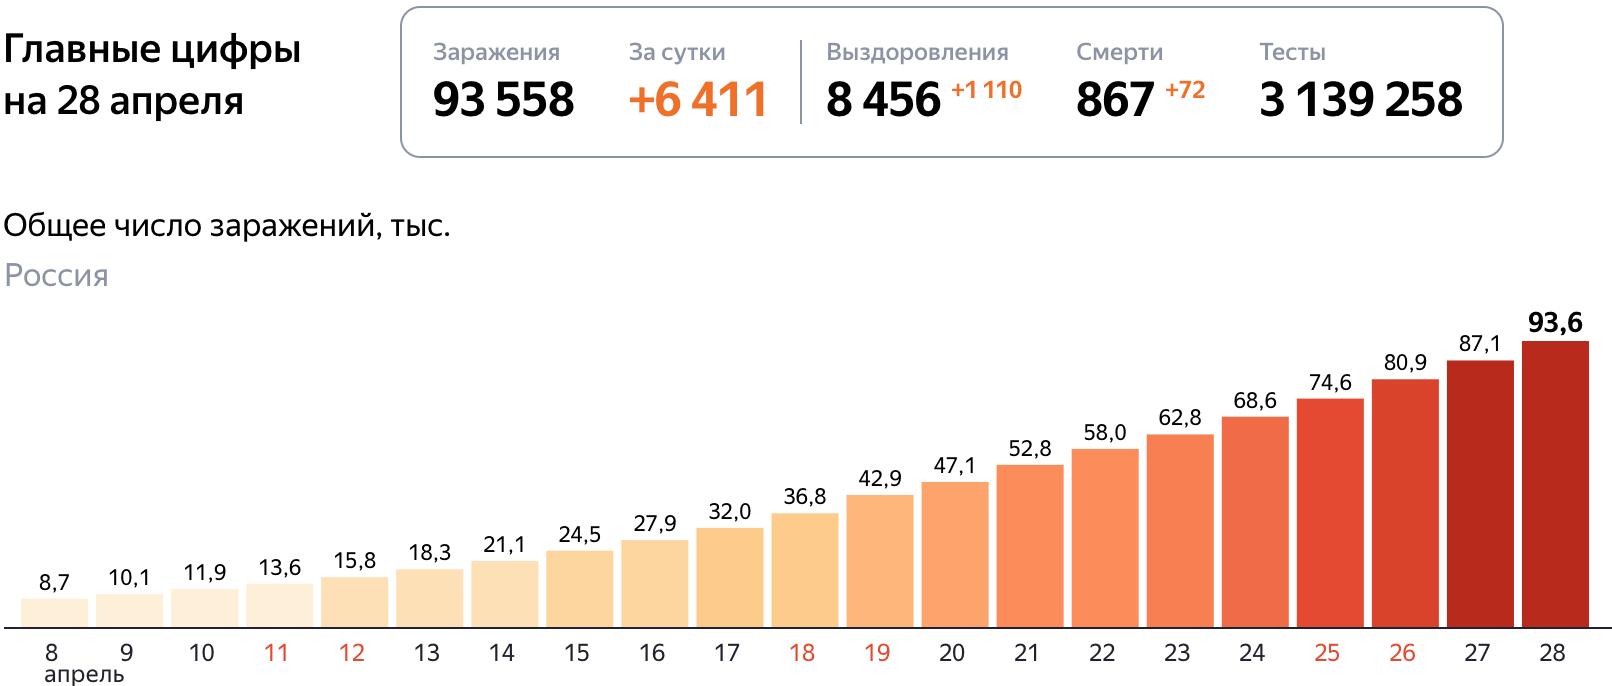 Коронавирус статистика на 28 апреля в России